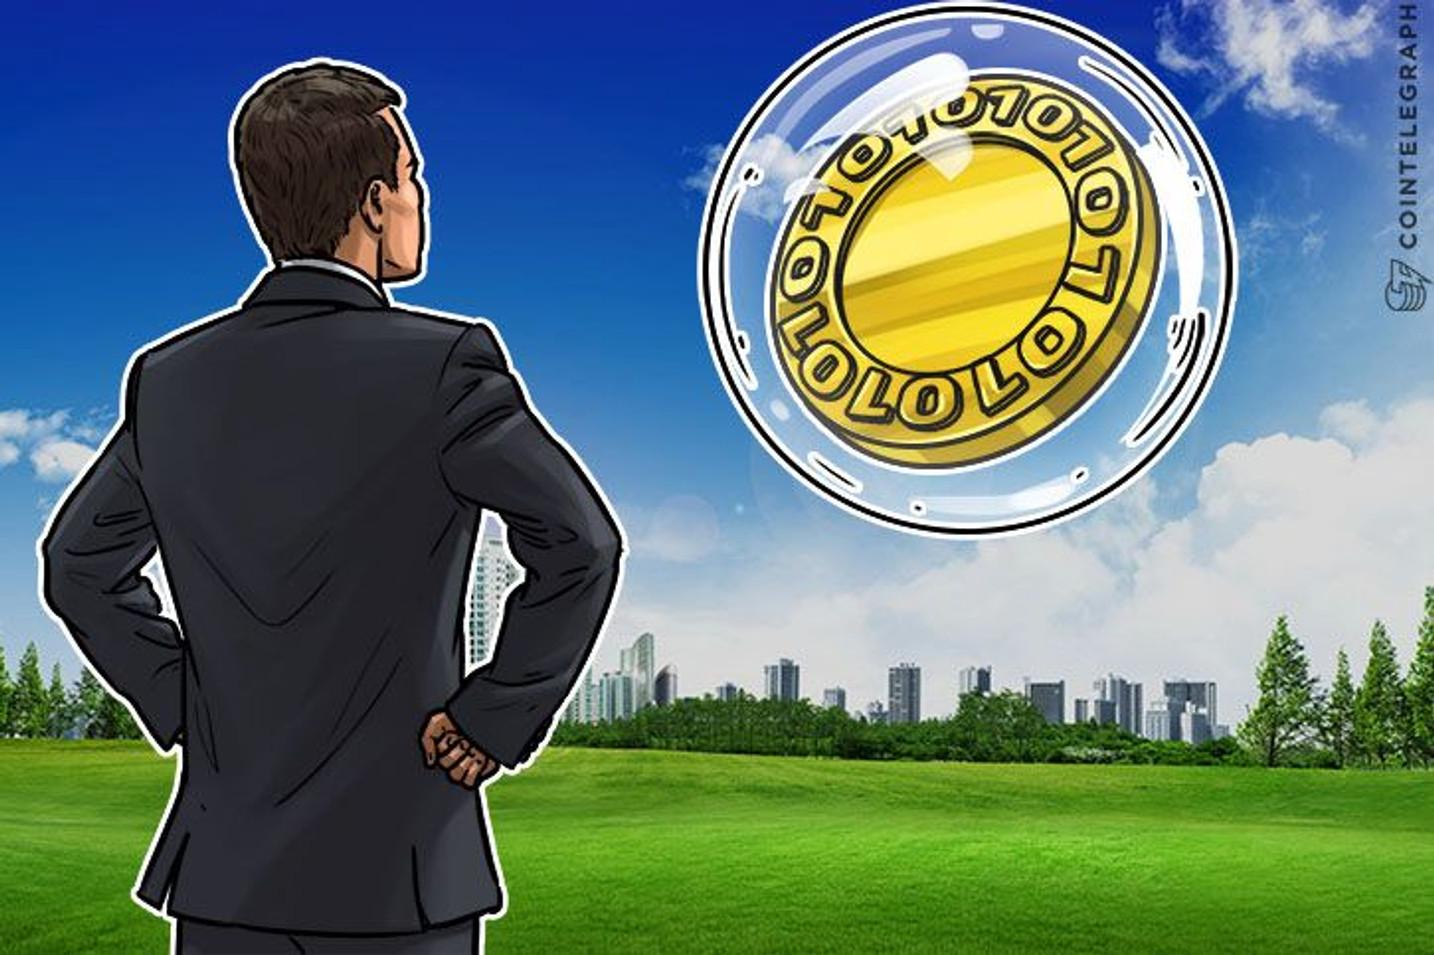 Investor Who Predicted 2008 Mortgage Crisis Bearish About Bitcoin